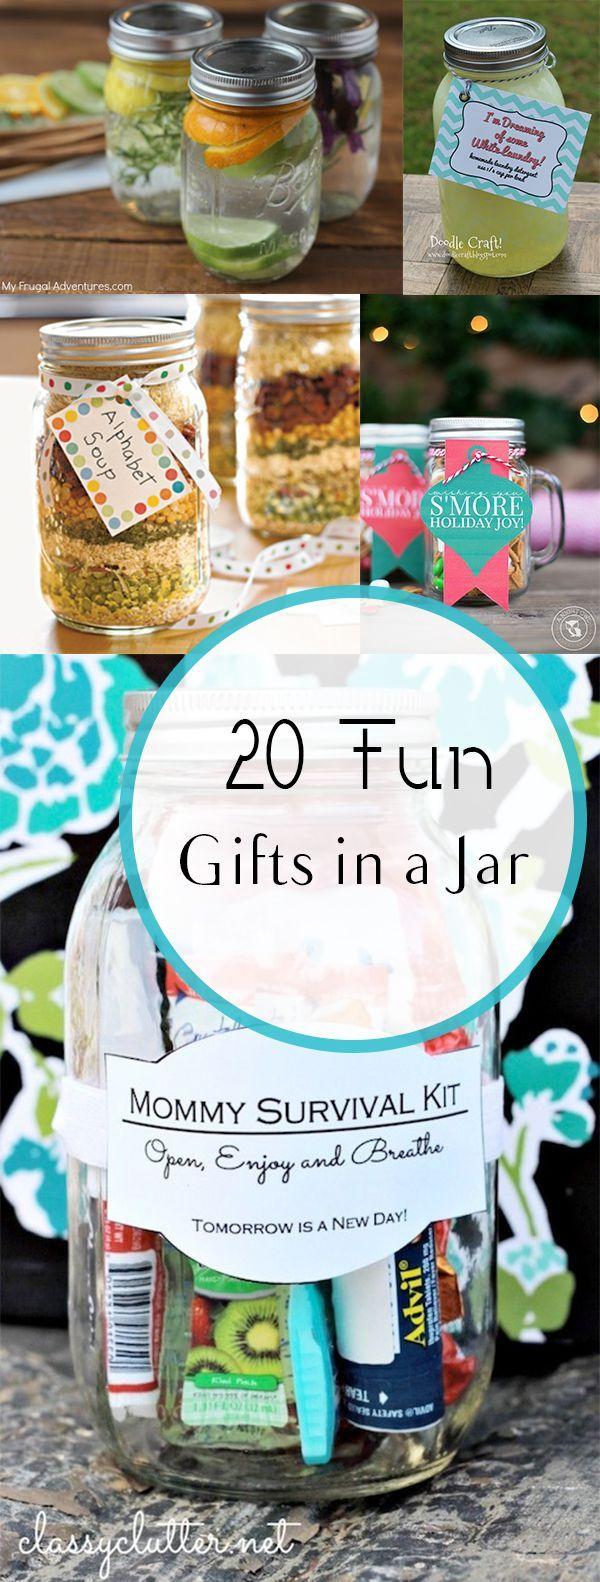 "20 Fun Gifts in a Jar ""#giftsinajar Jar Gifts Gifts in a Jar  """